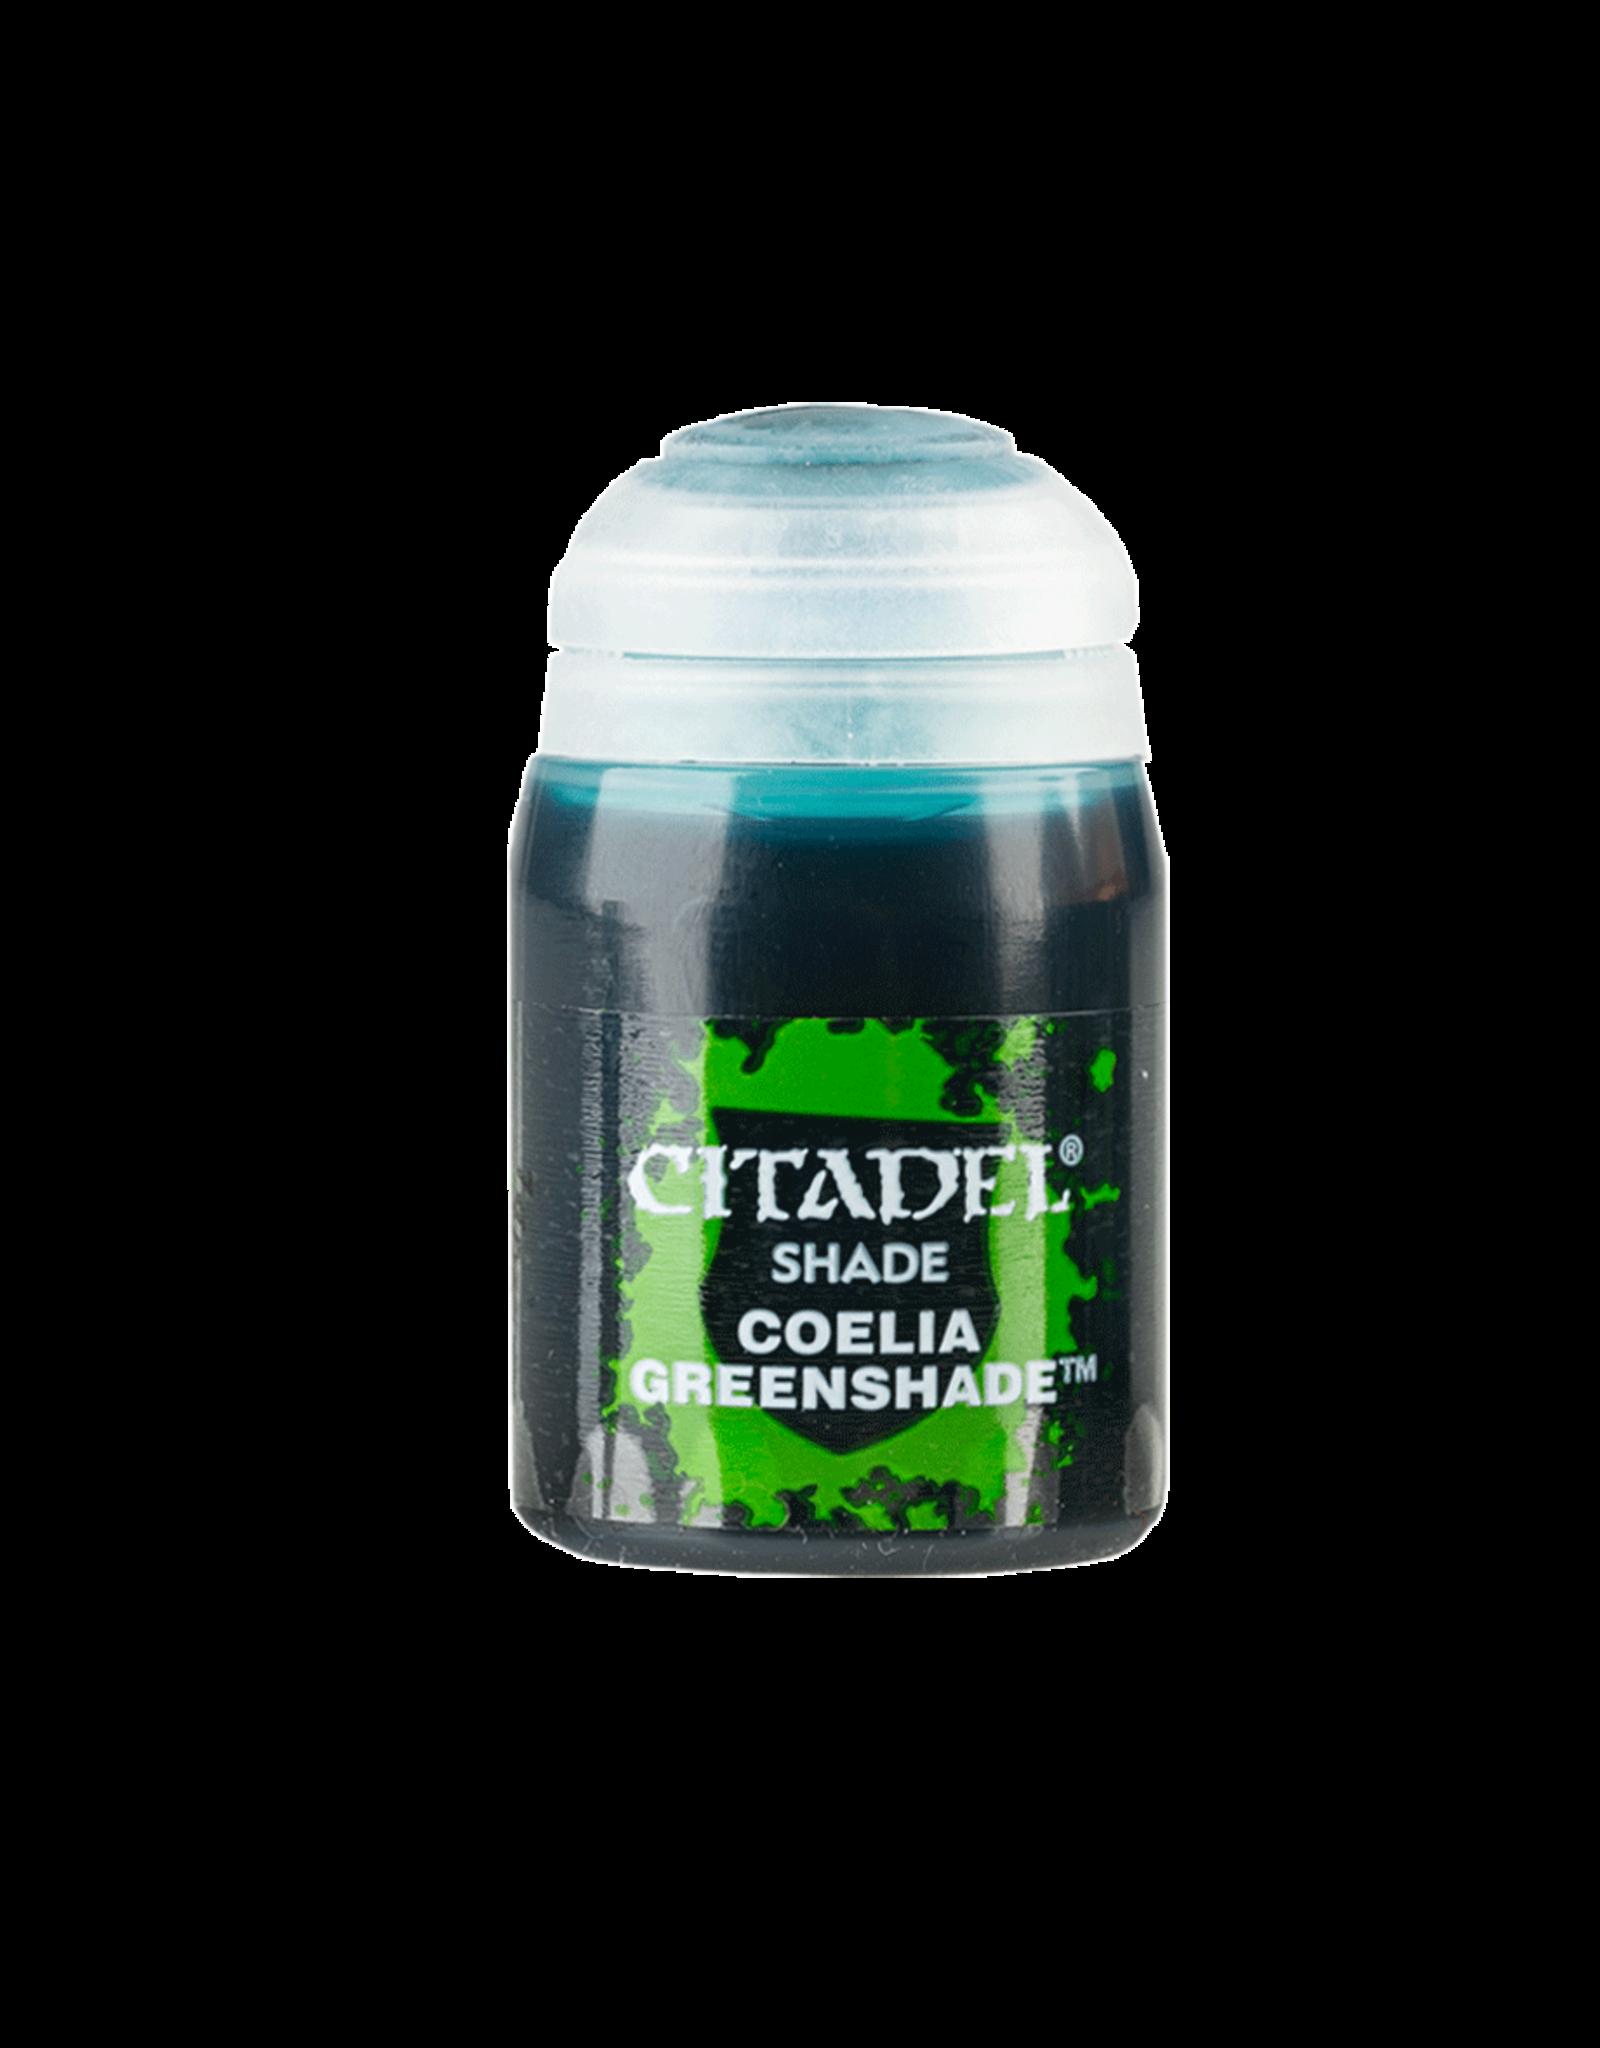 Citadel Citadel Paints: Shade -  Coelia Greenshade